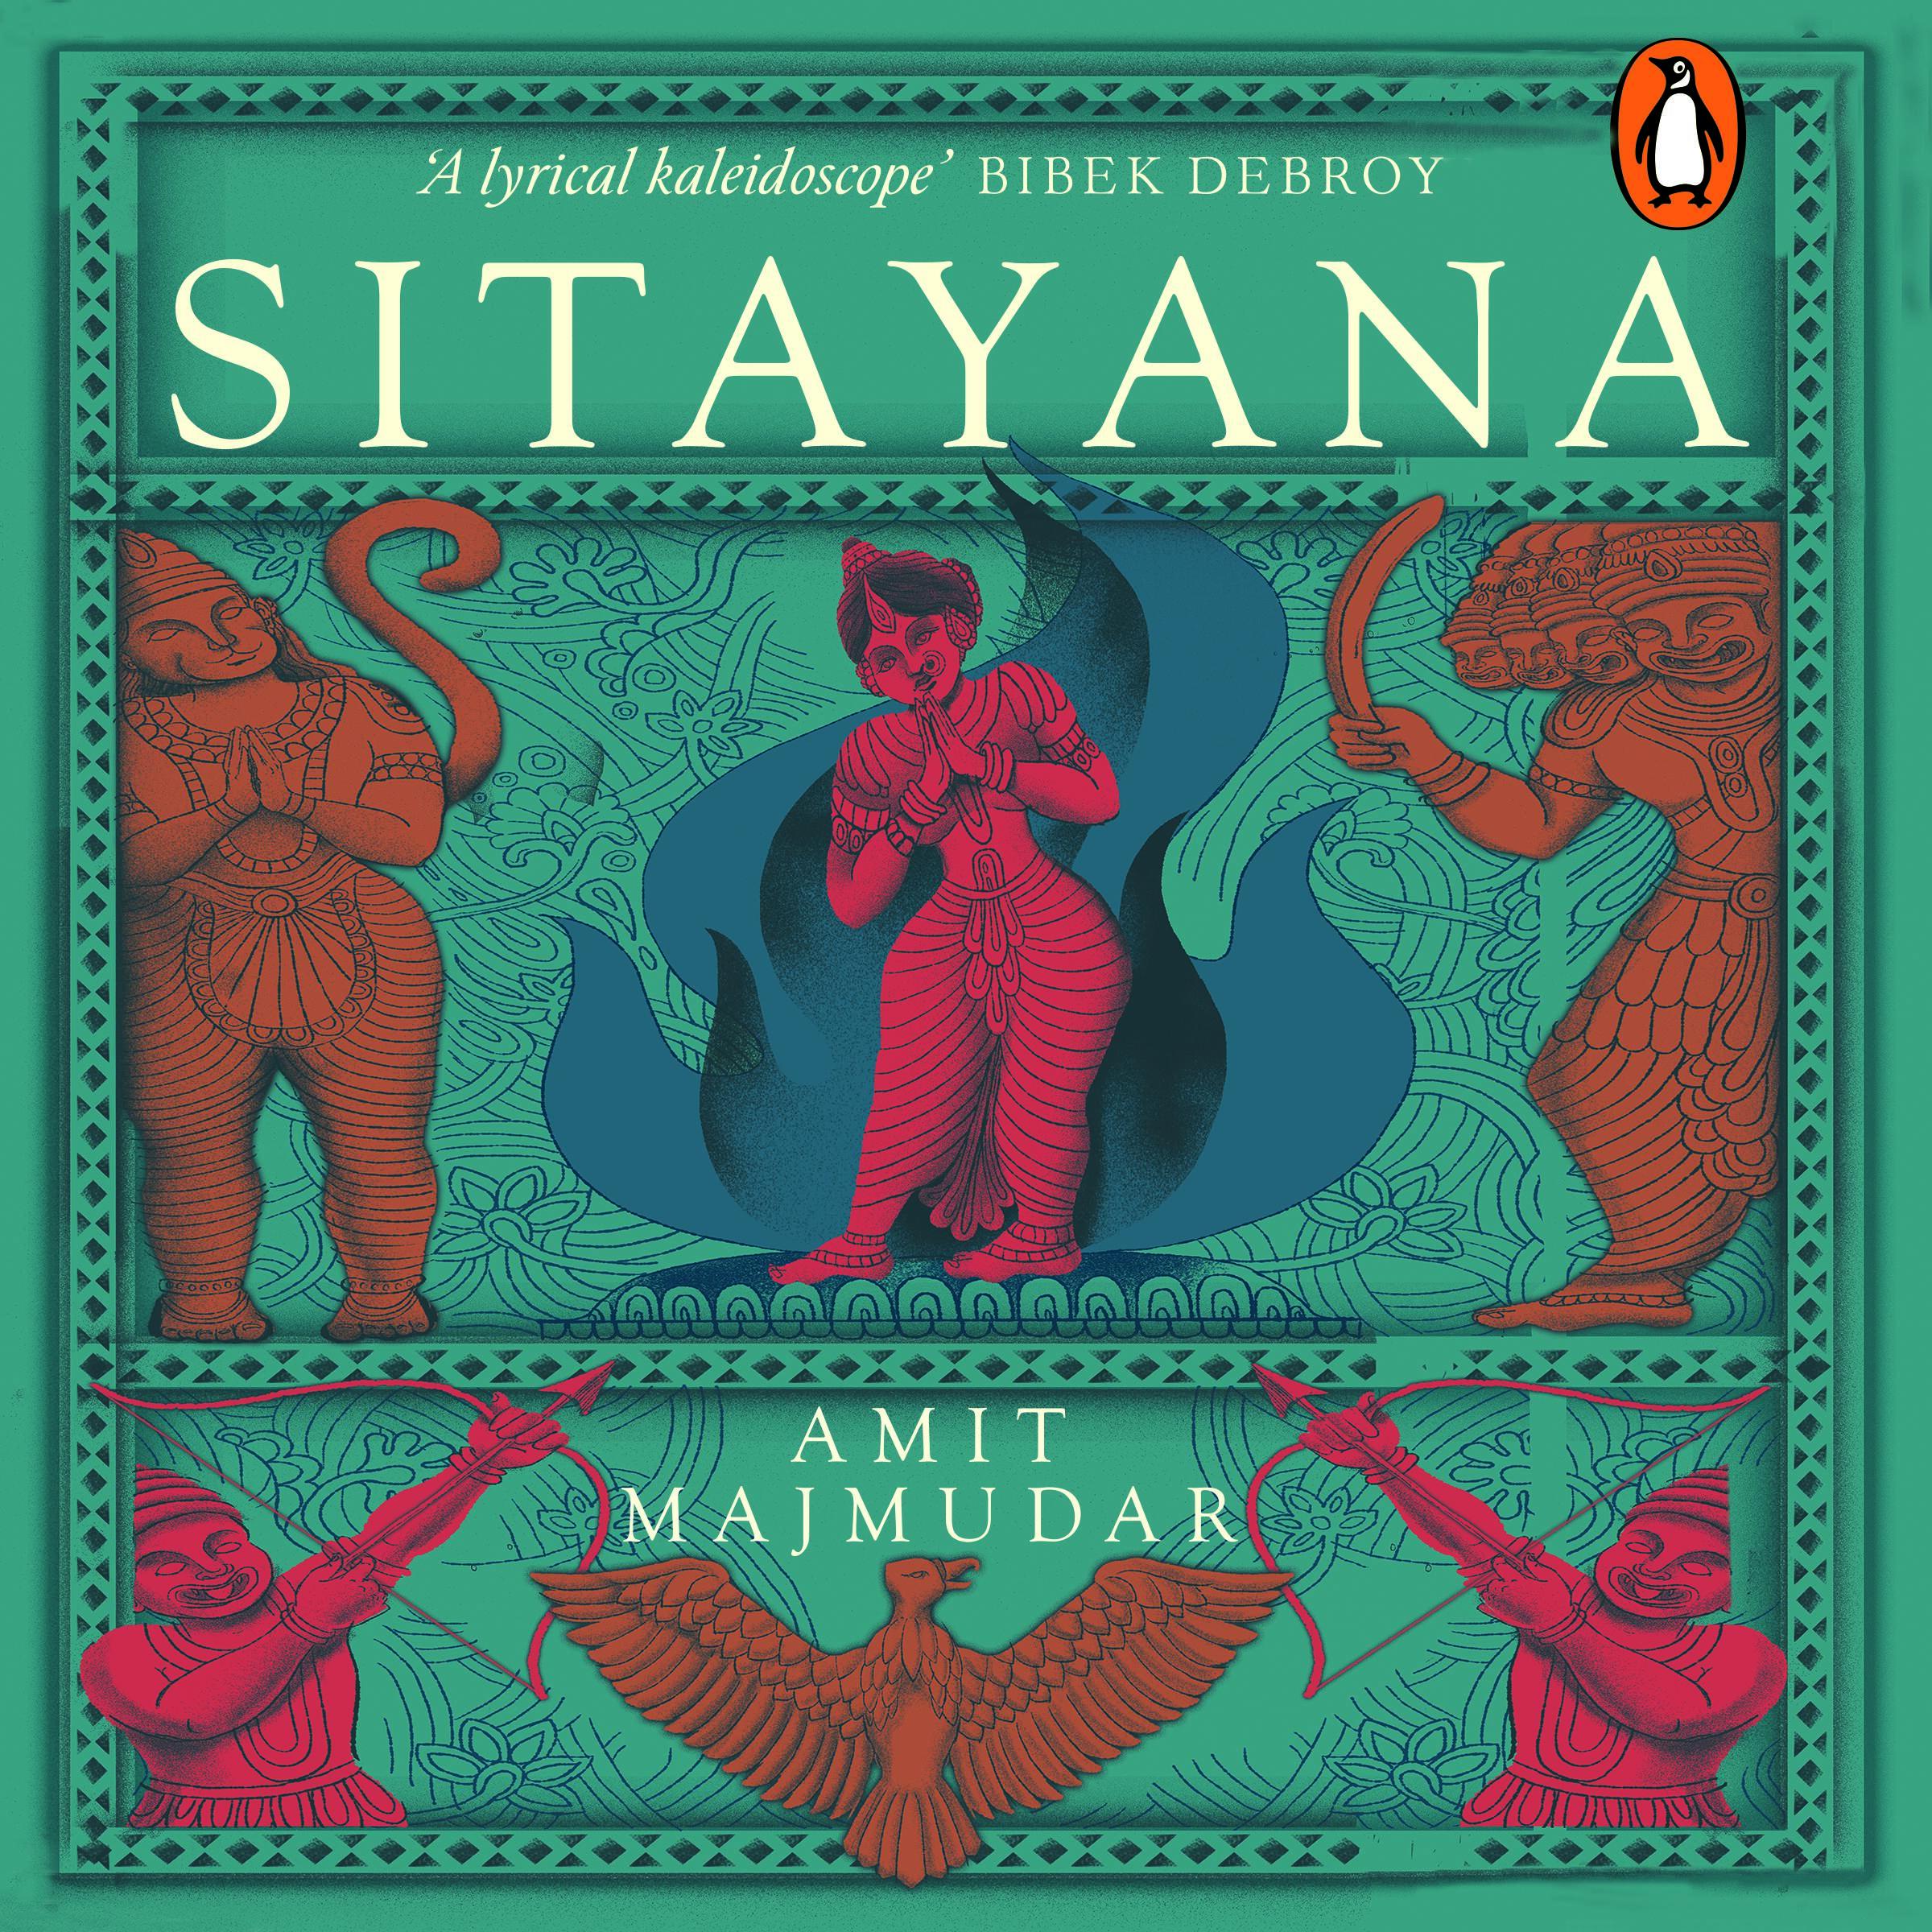 Sitayana